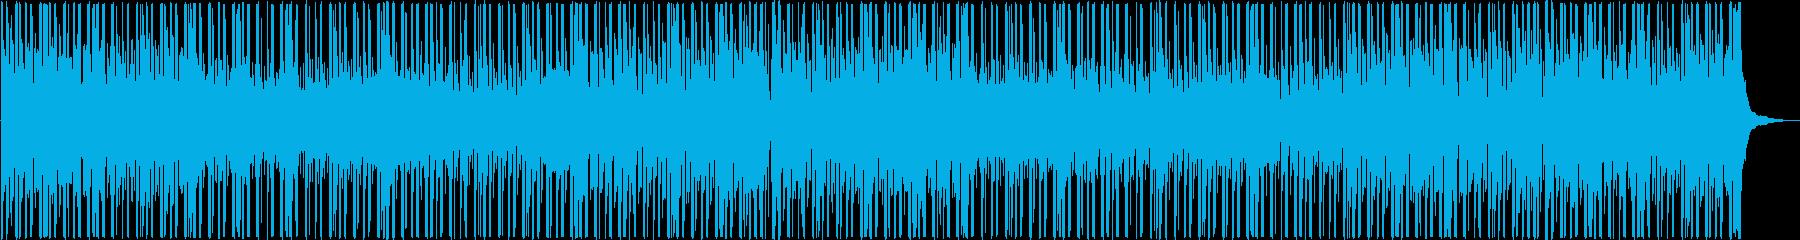 R&B 感動的 綺麗 ピアノの再生済みの波形